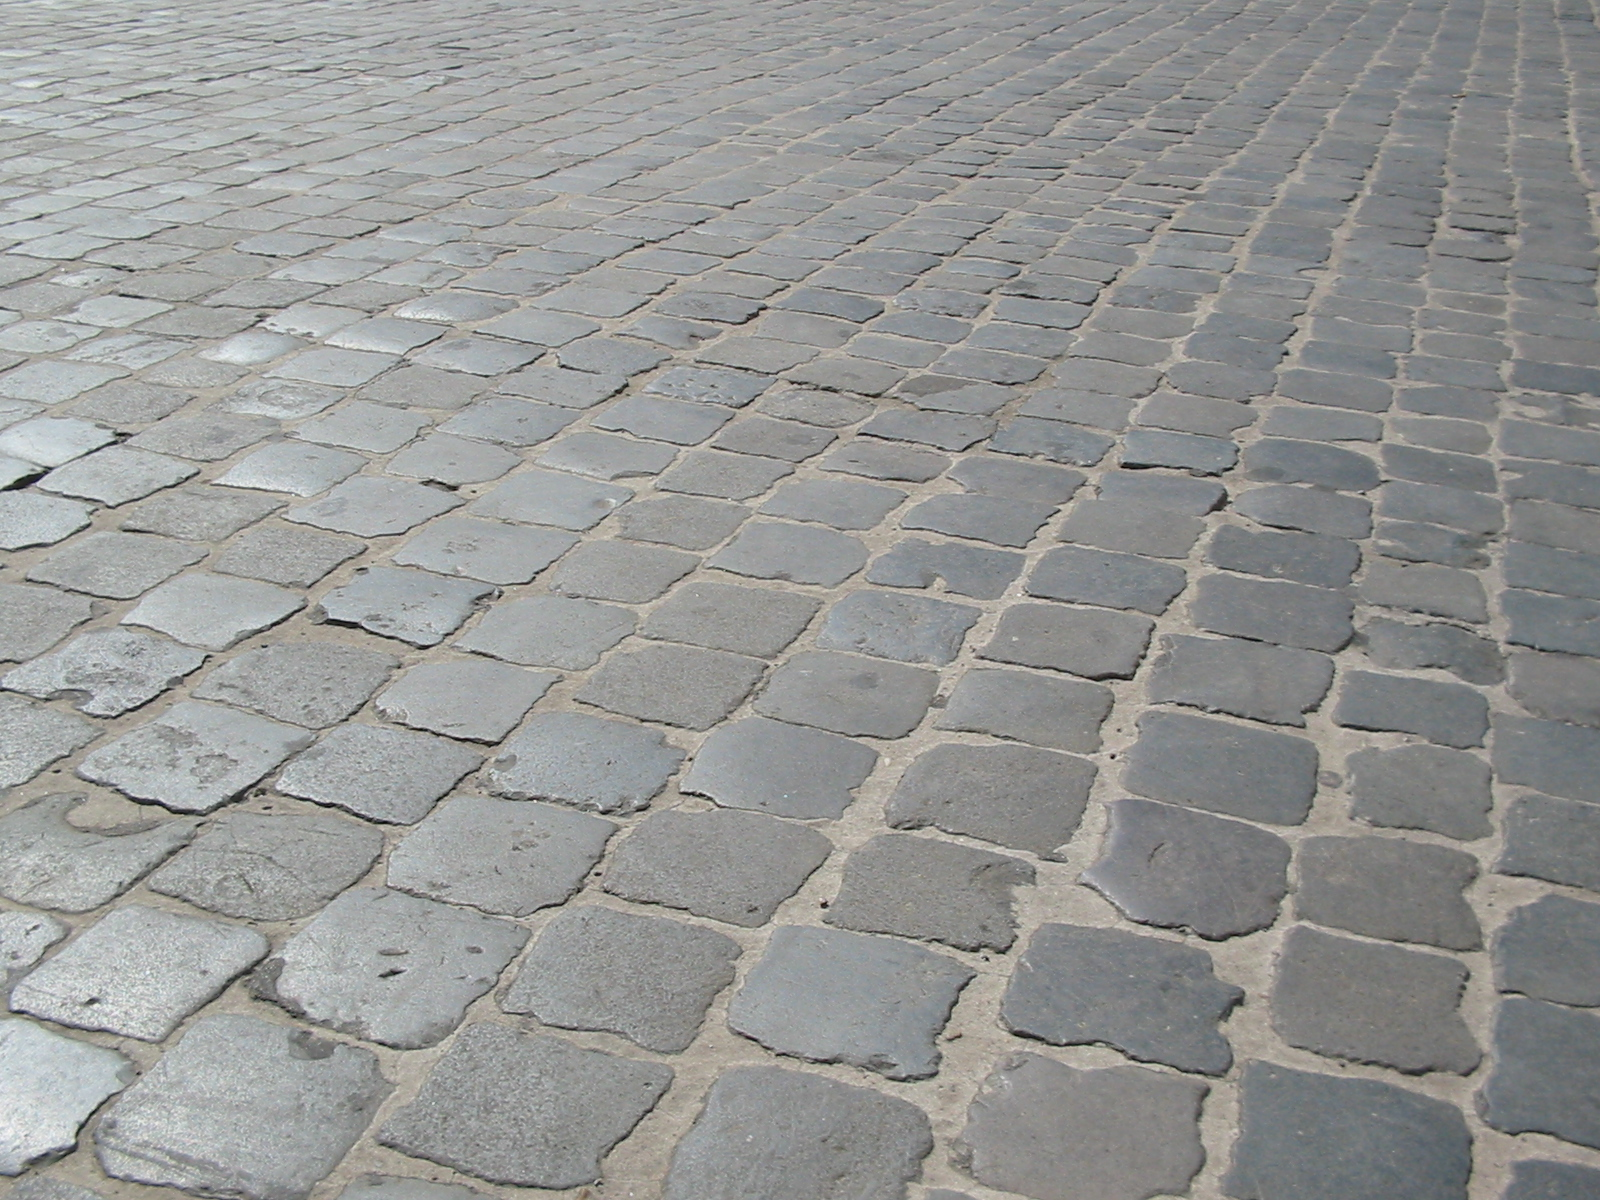 Pavimento Que Es : Adoquín wikipedia la enciclopedia libre